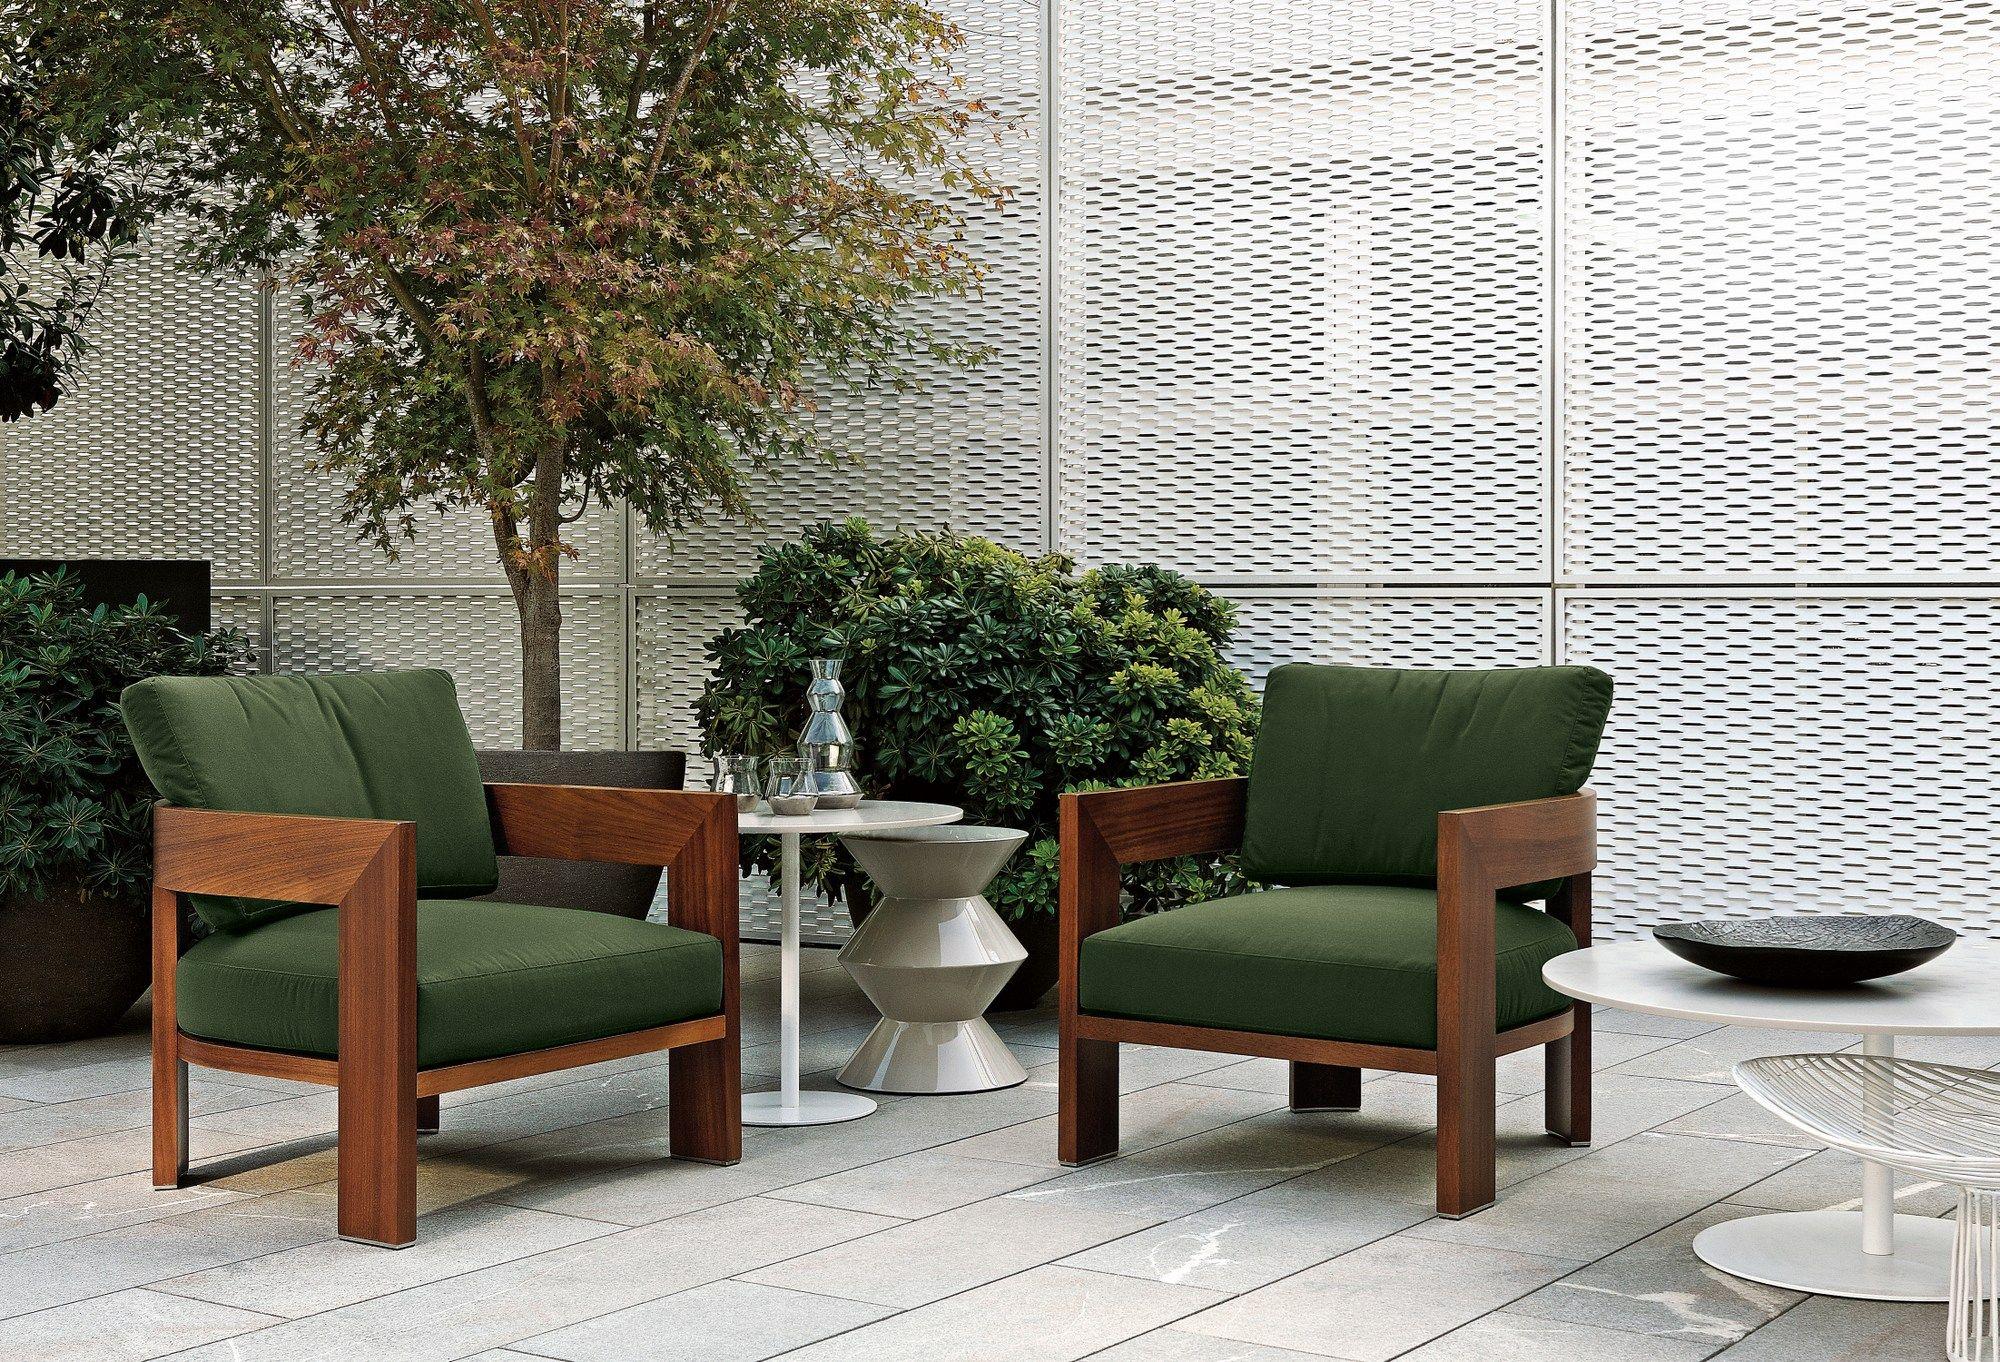 Poltrona da outdoor warhol iroko outdoor by minotti design for Poltrona da terrazzo design